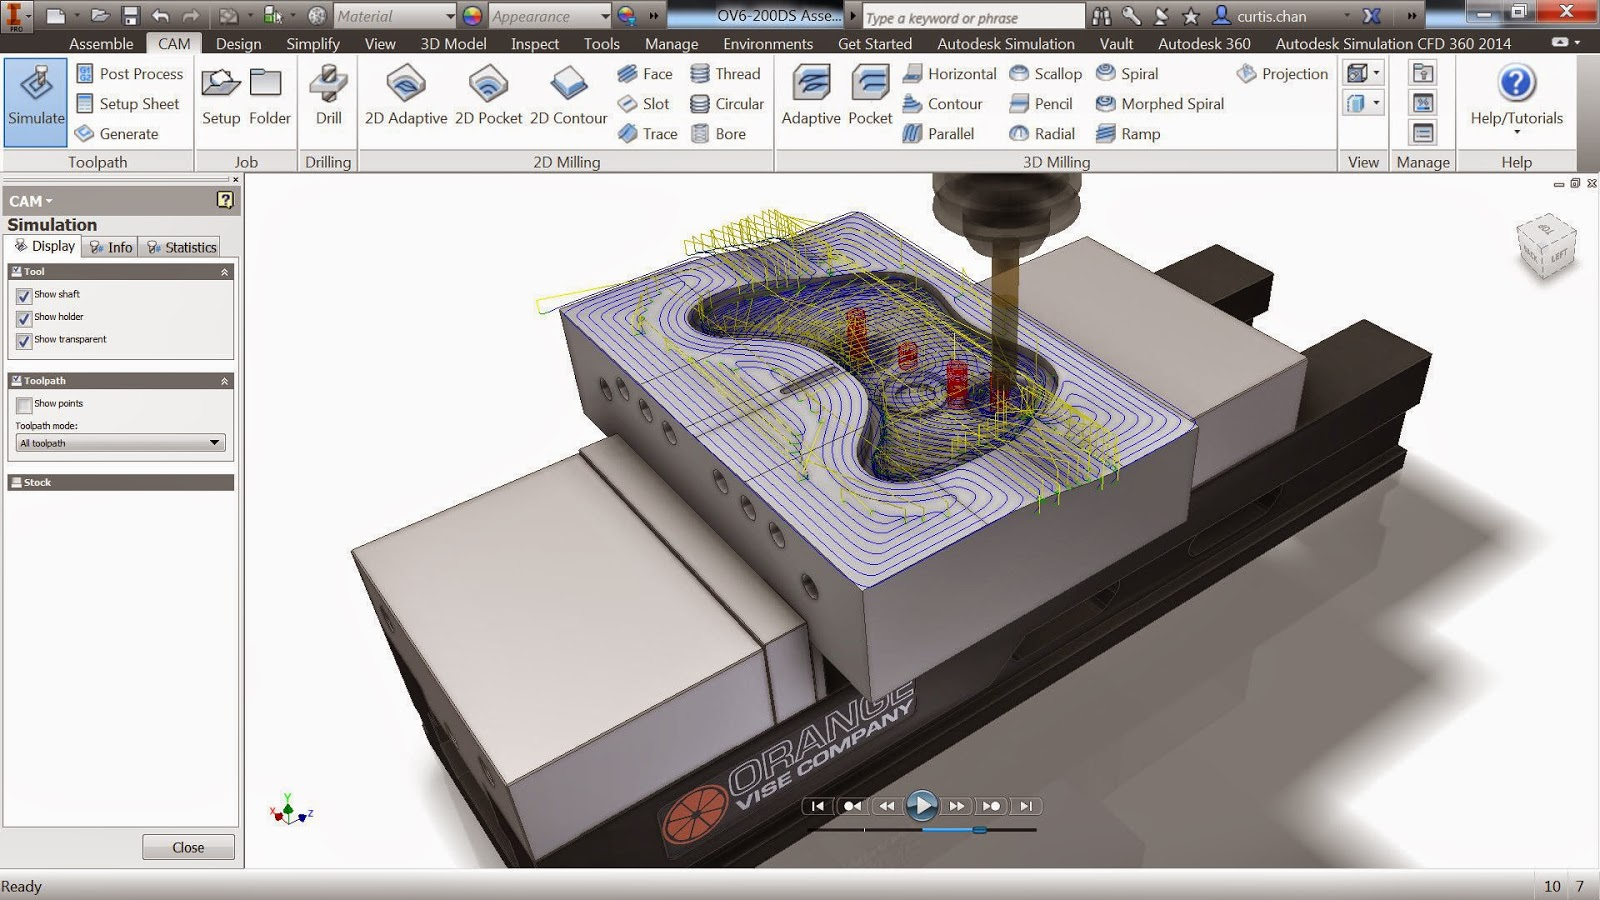 Autodesk Inventor Pro 2015